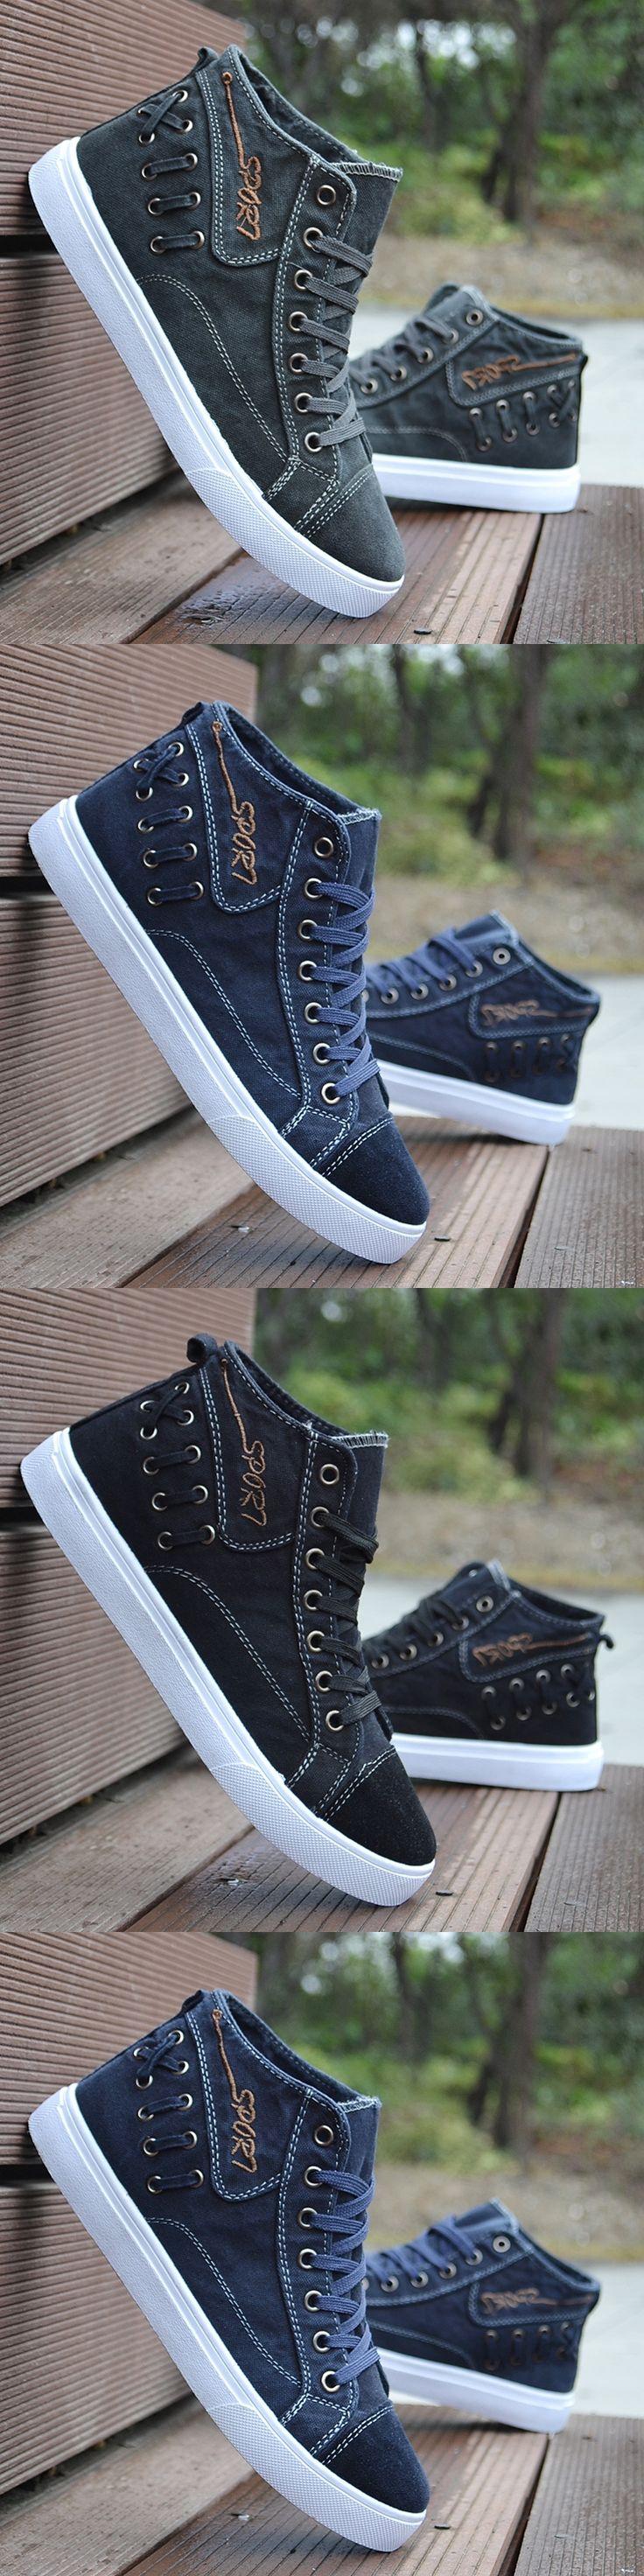 2017 Summer men shoes high top lace up Denim plimsolls Korean lace up casual Flat Shoes student School zapatos hombre T022412